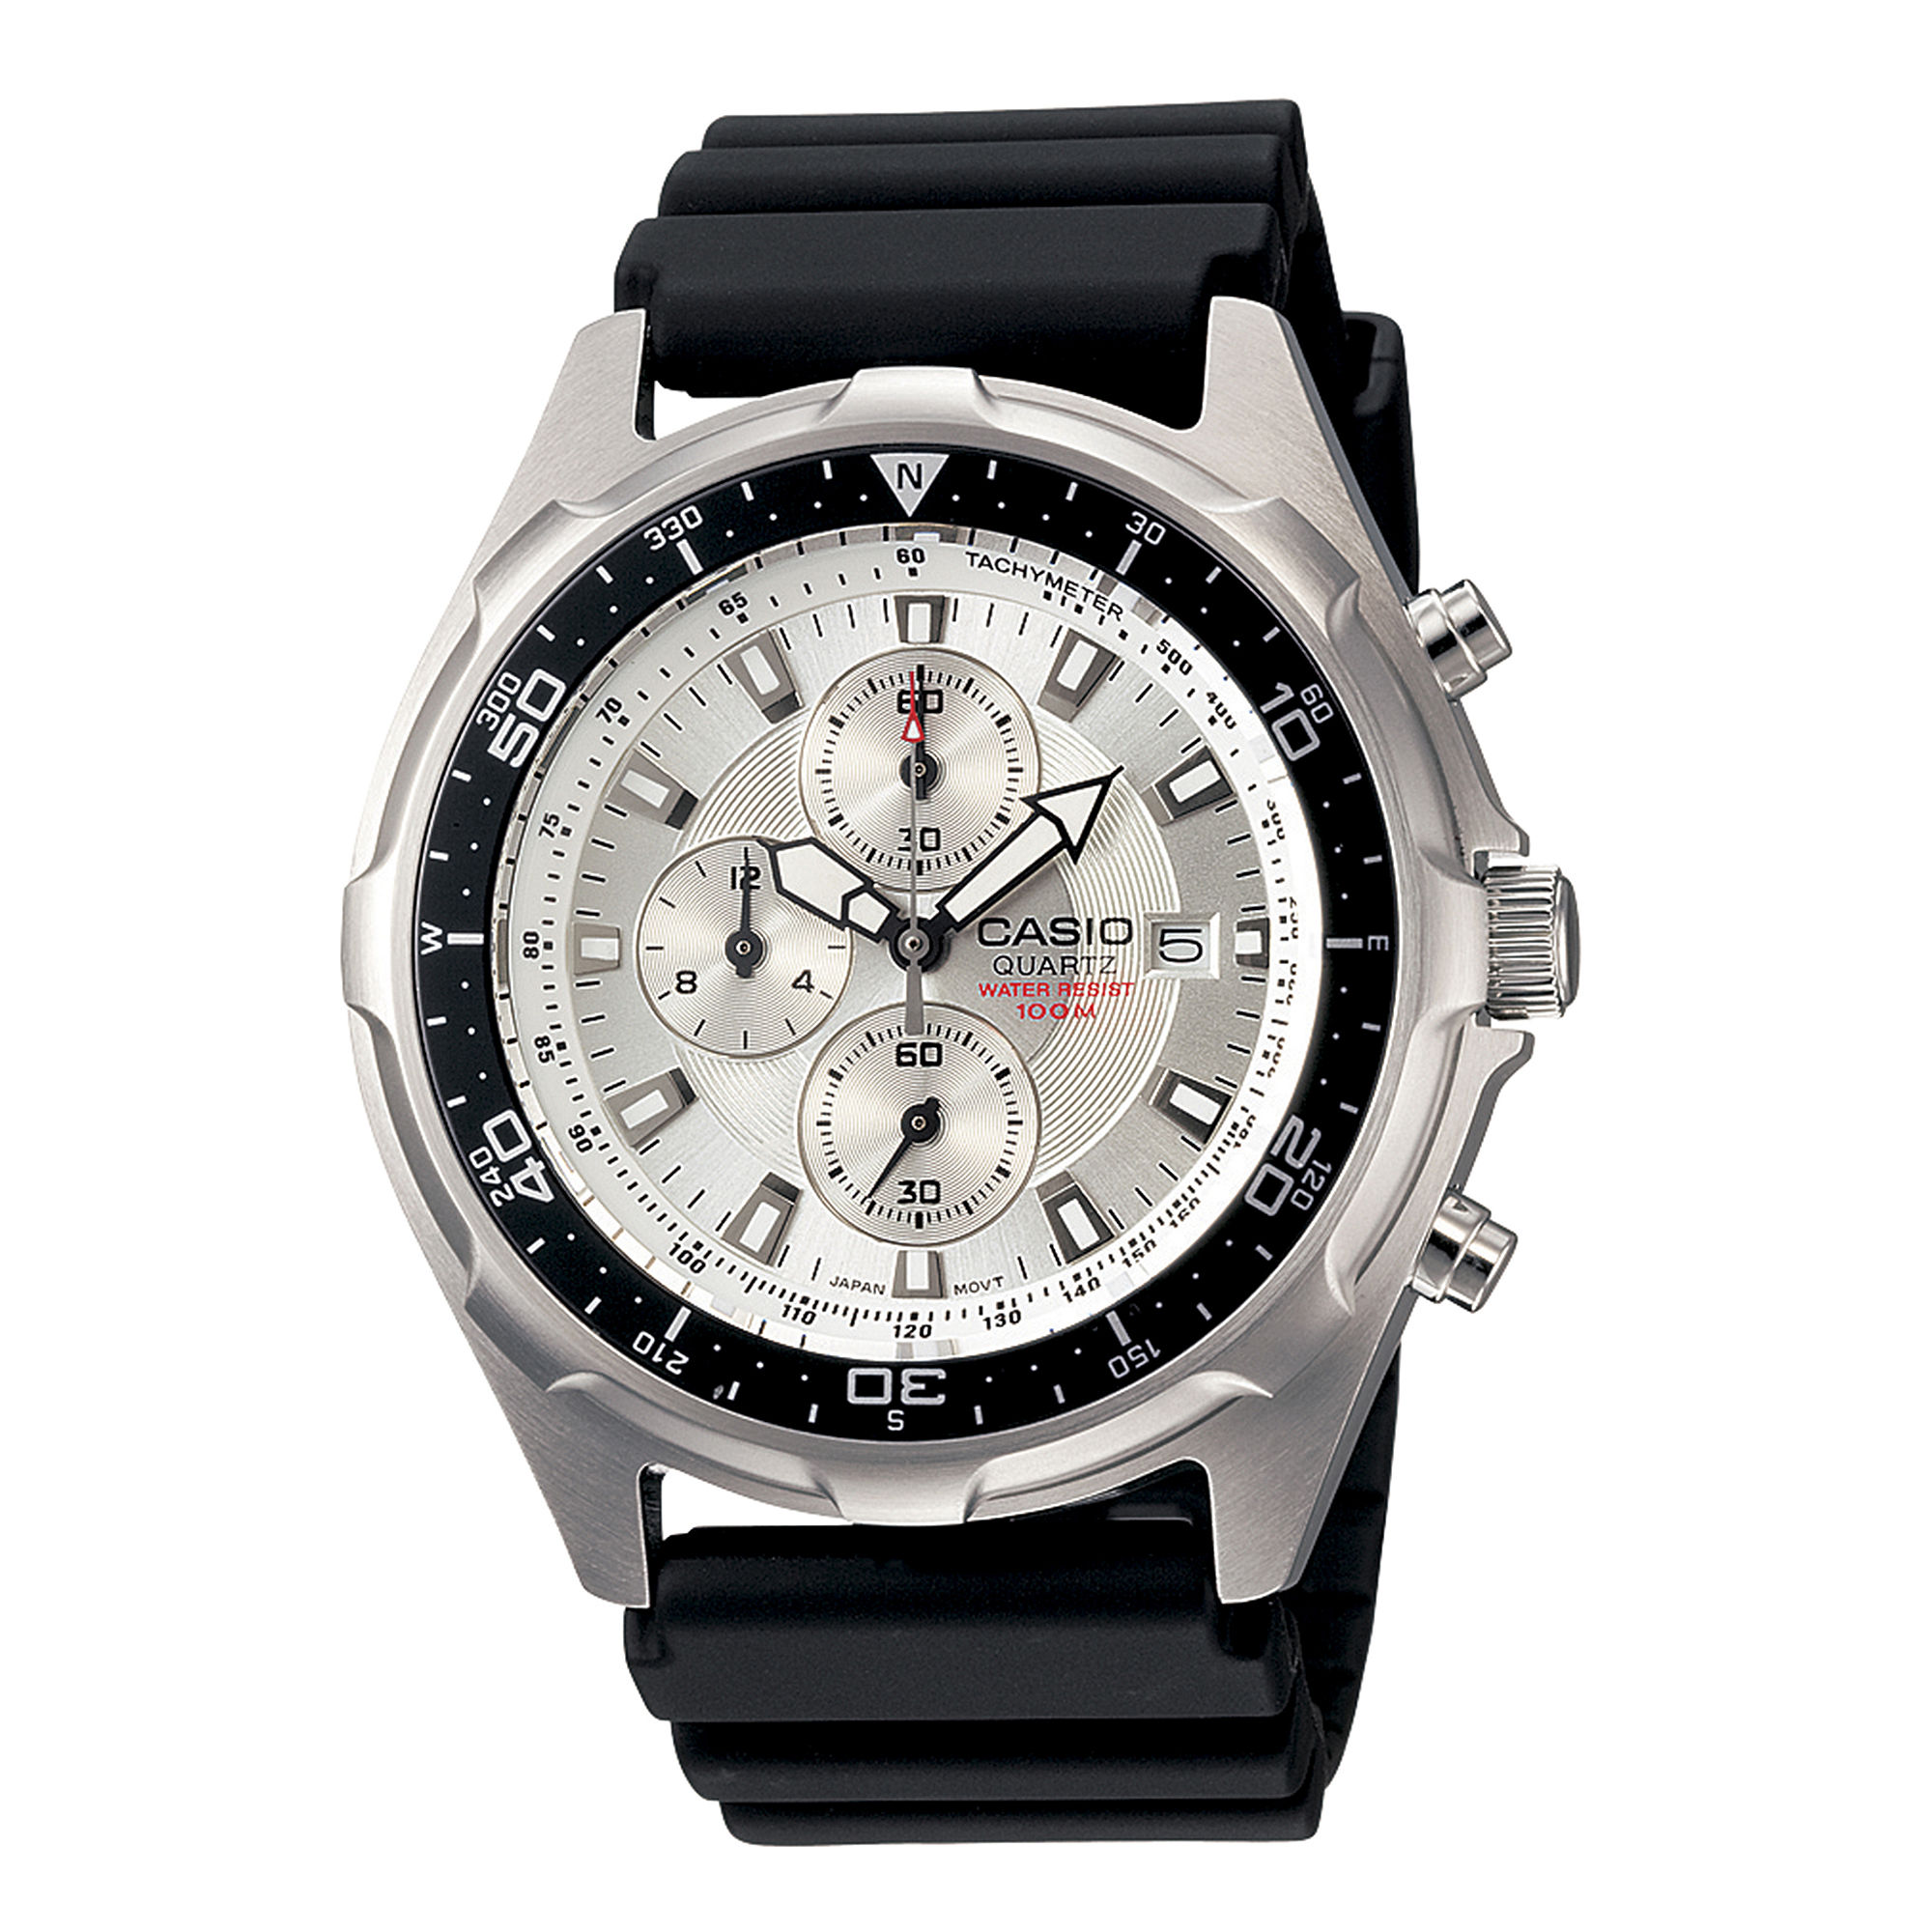 Casio Mens Black Resin Strap Chronograph Watch AMW330-7AV